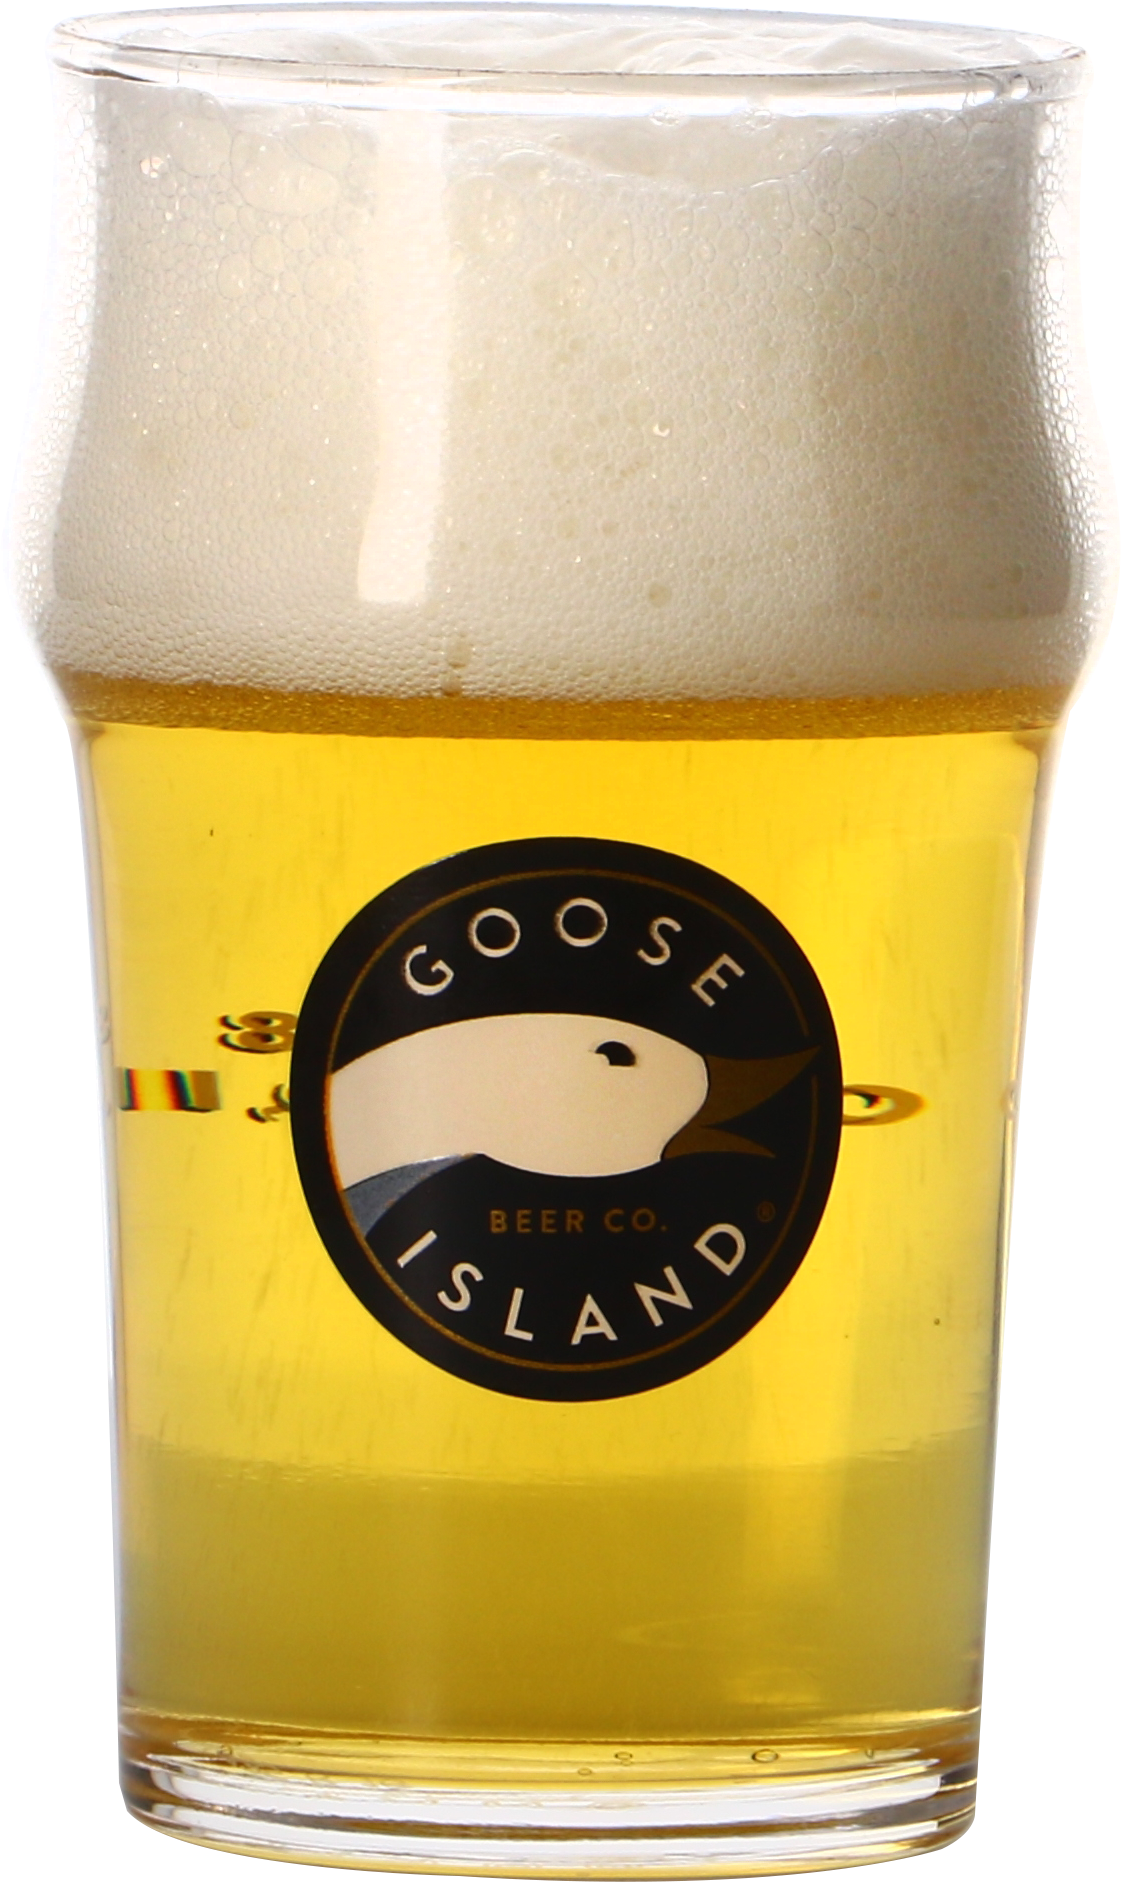 Verre plat Goose Island